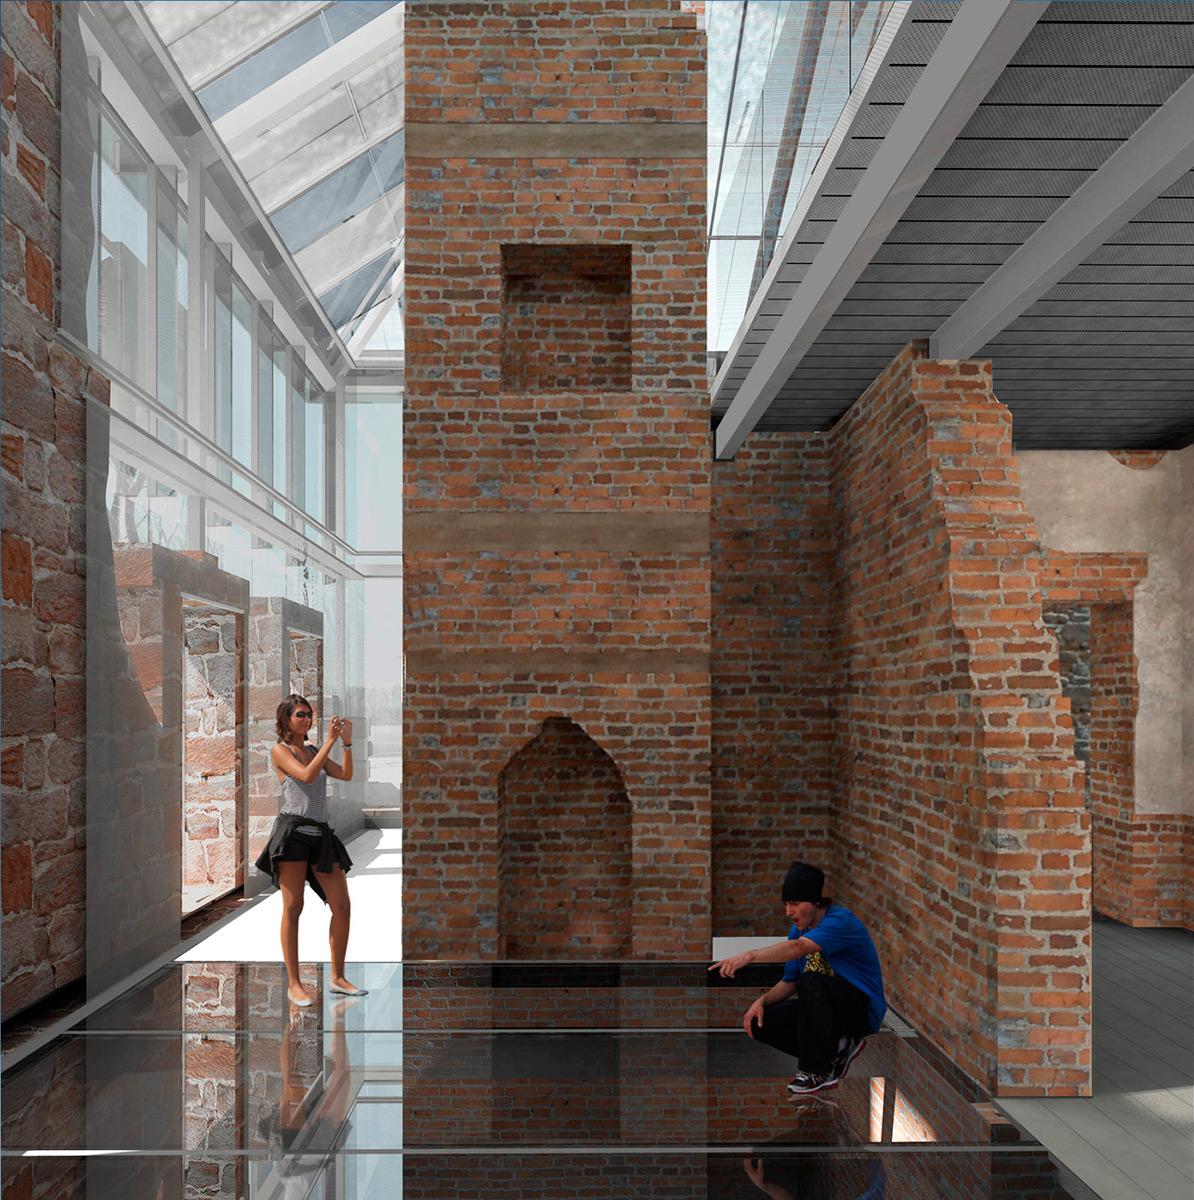 The-Glass-House-Project-Menokin-Machado-Silvetti-06